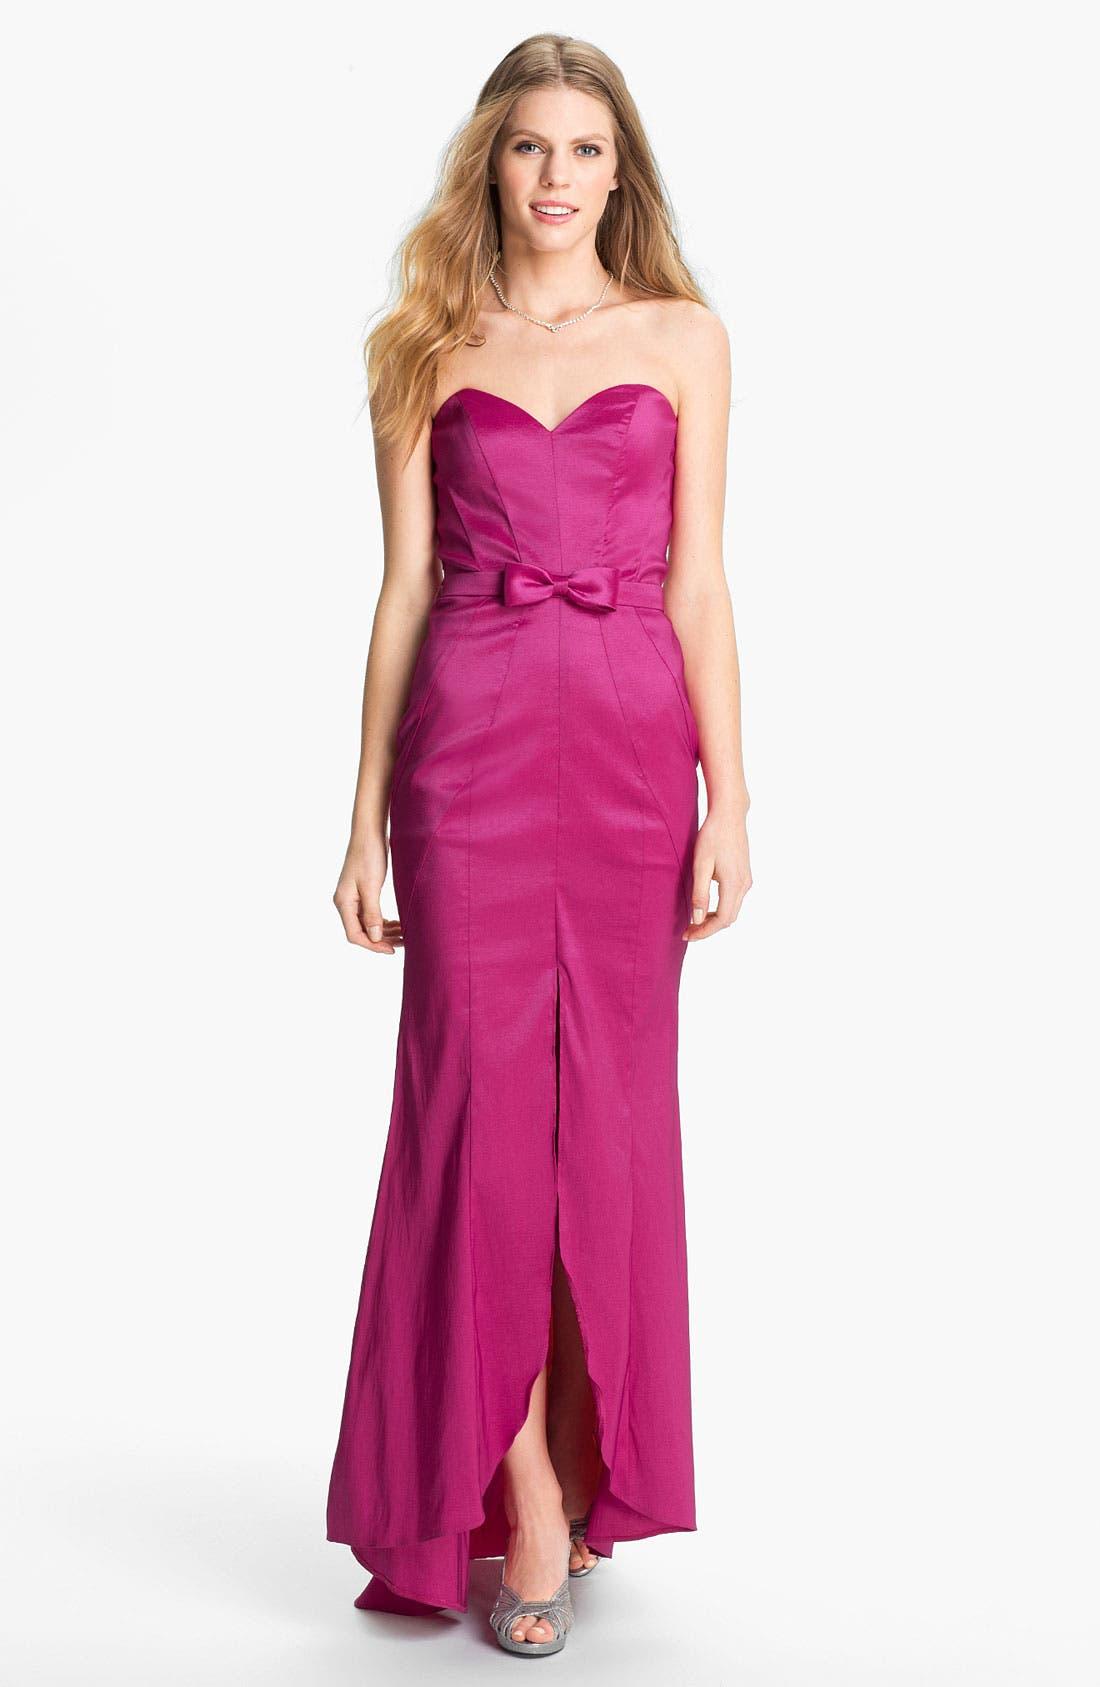 Main Image - Jessica McClintock Seamed Strapless Taffeta Gown